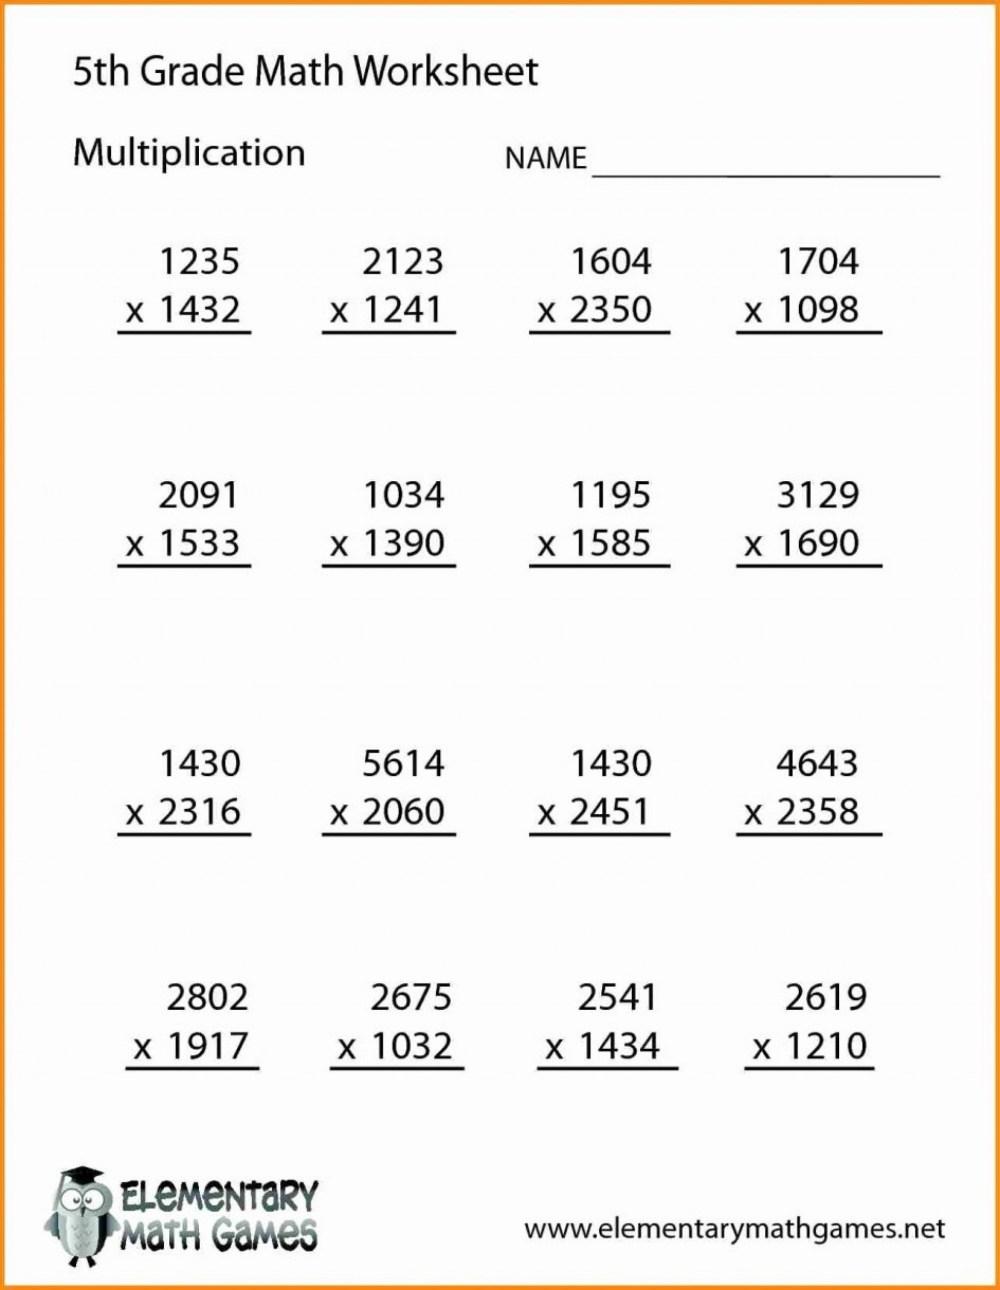 medium resolution of 5th Grade Word Problems Printable Worksheets   Printable Worksheets and  Activities for Teachers